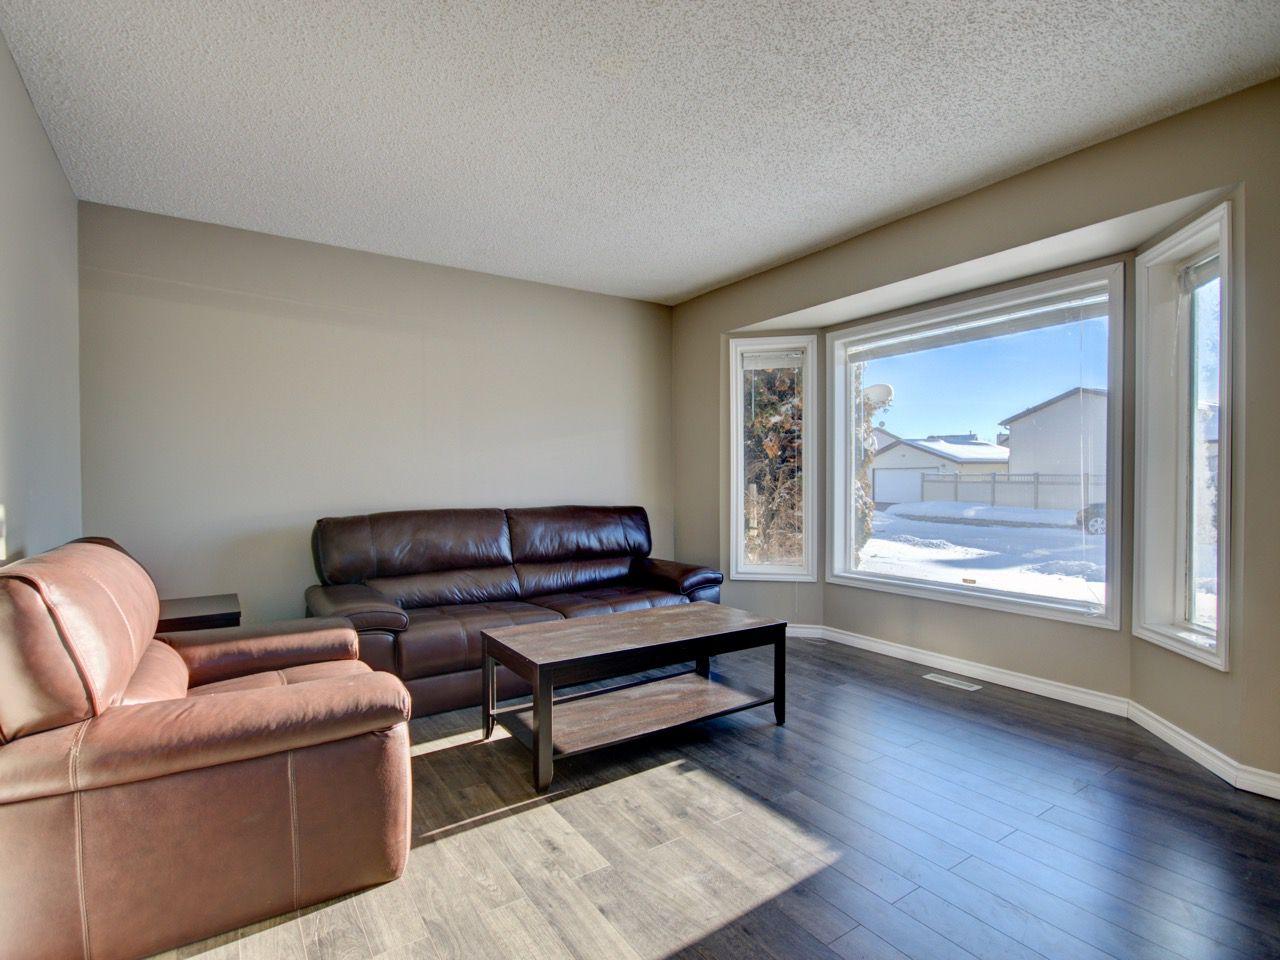 Main Photo: 8332 158 Avenue in Edmonton: Zone 28 House for sale : MLS®# E4139030